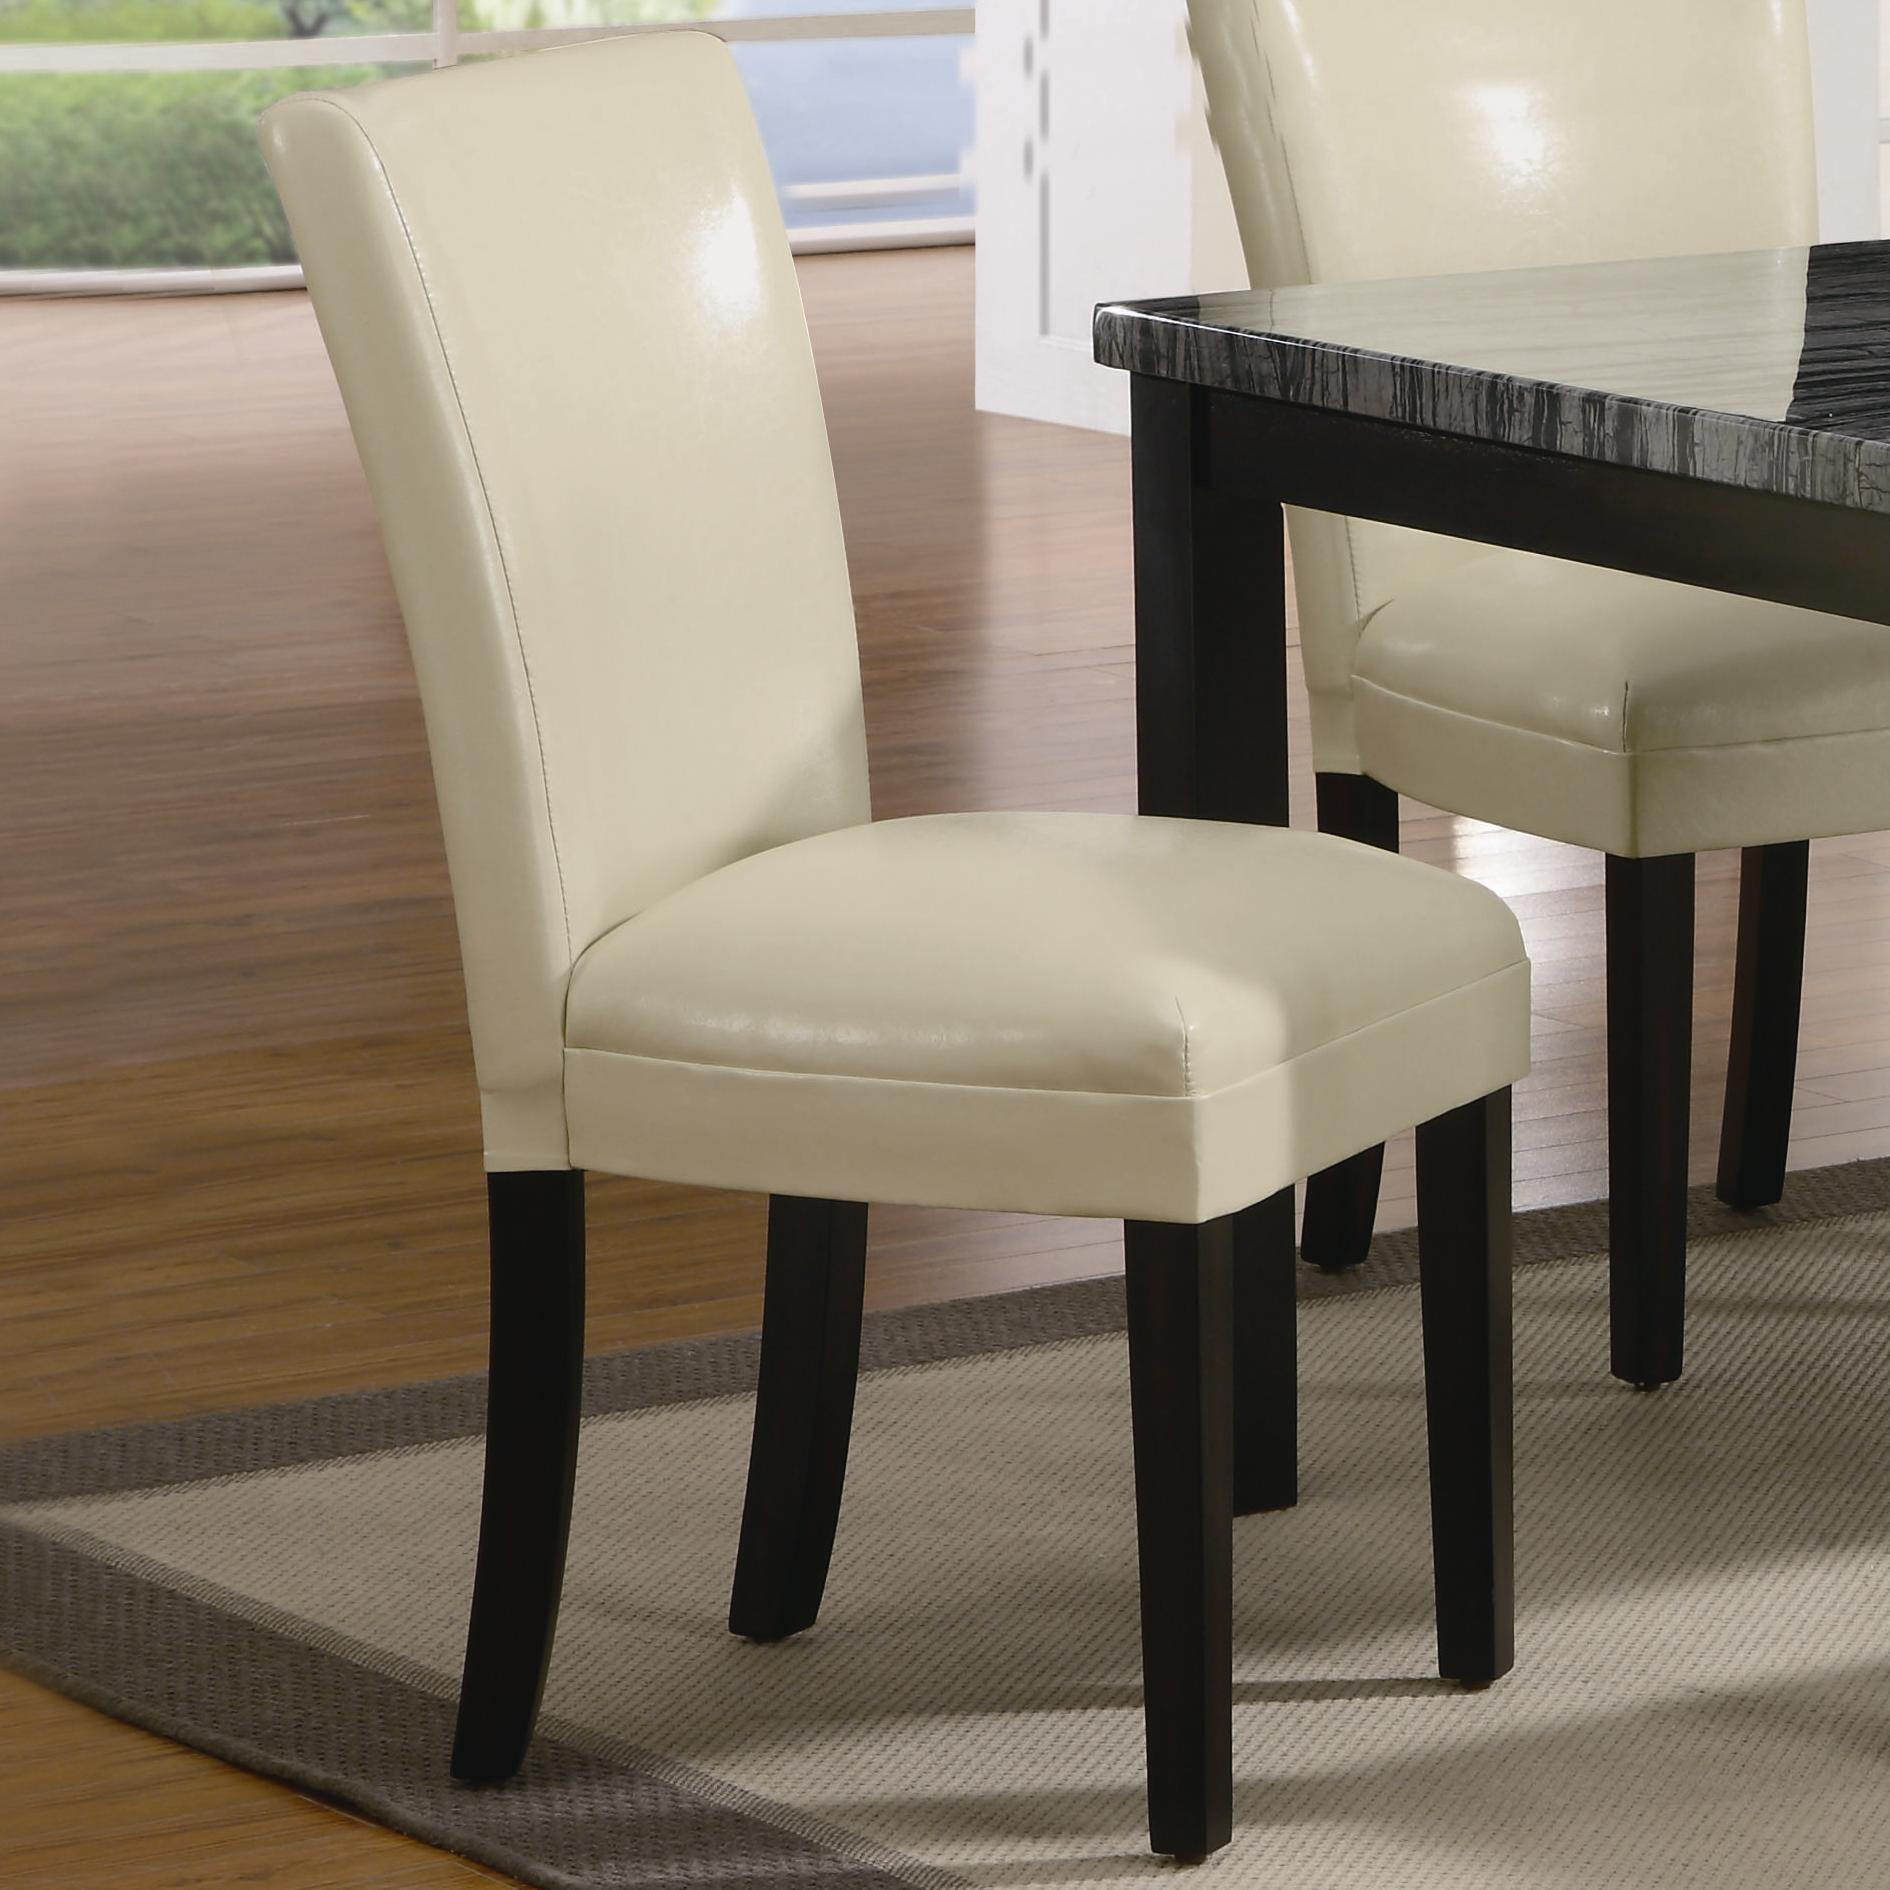 Coaster Carter Upholstered Dining Side Chair - Item Number: 102264